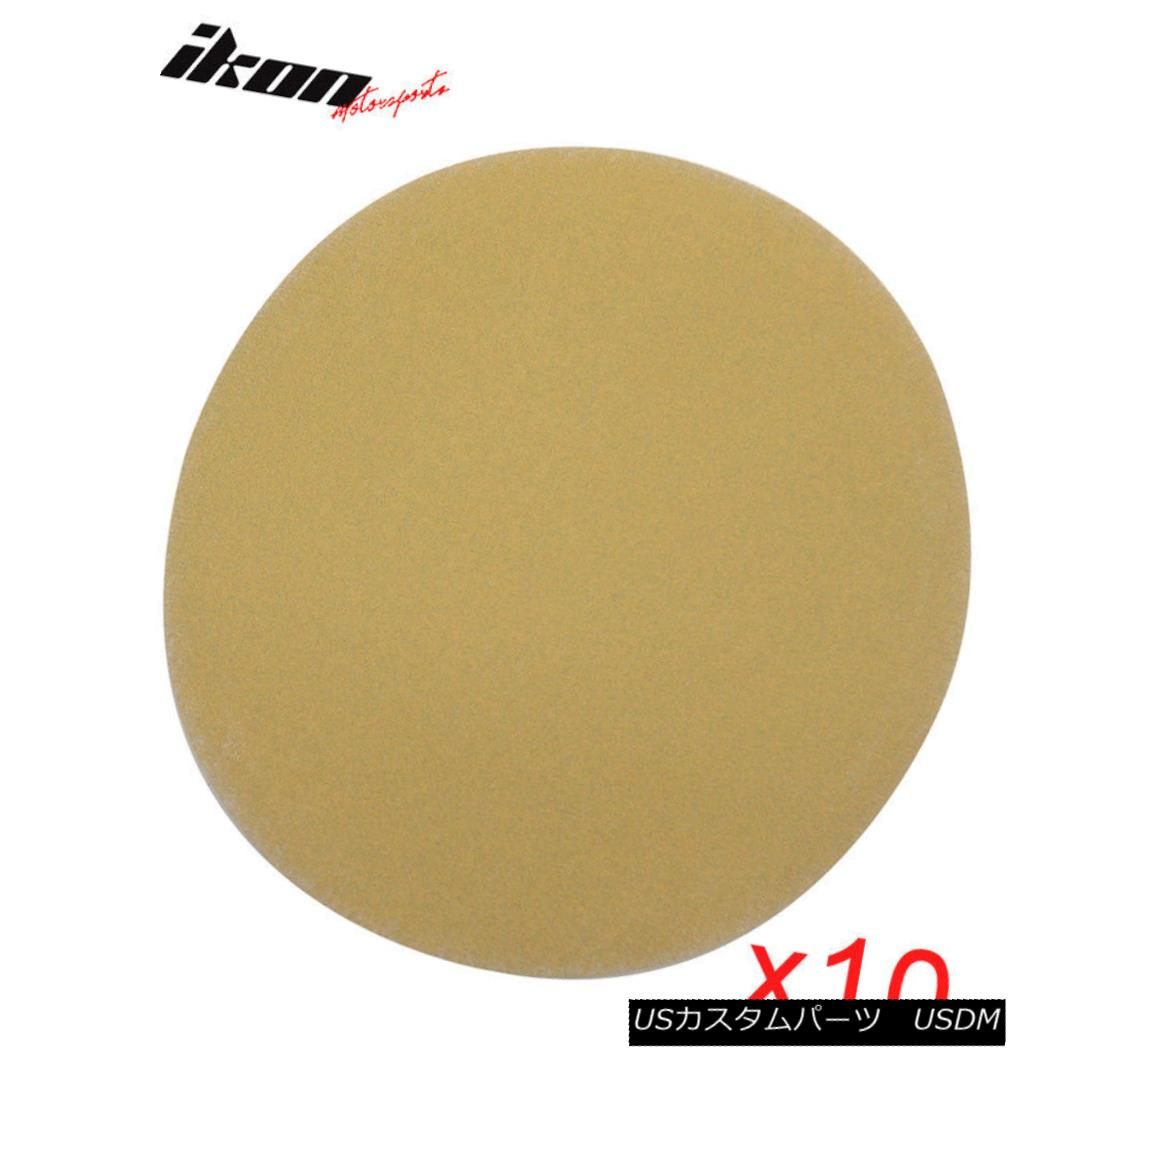 Fit x50 Dry Sand Paper Bumper Collision Repair Sanding Disc 240 Grit 5 Inch